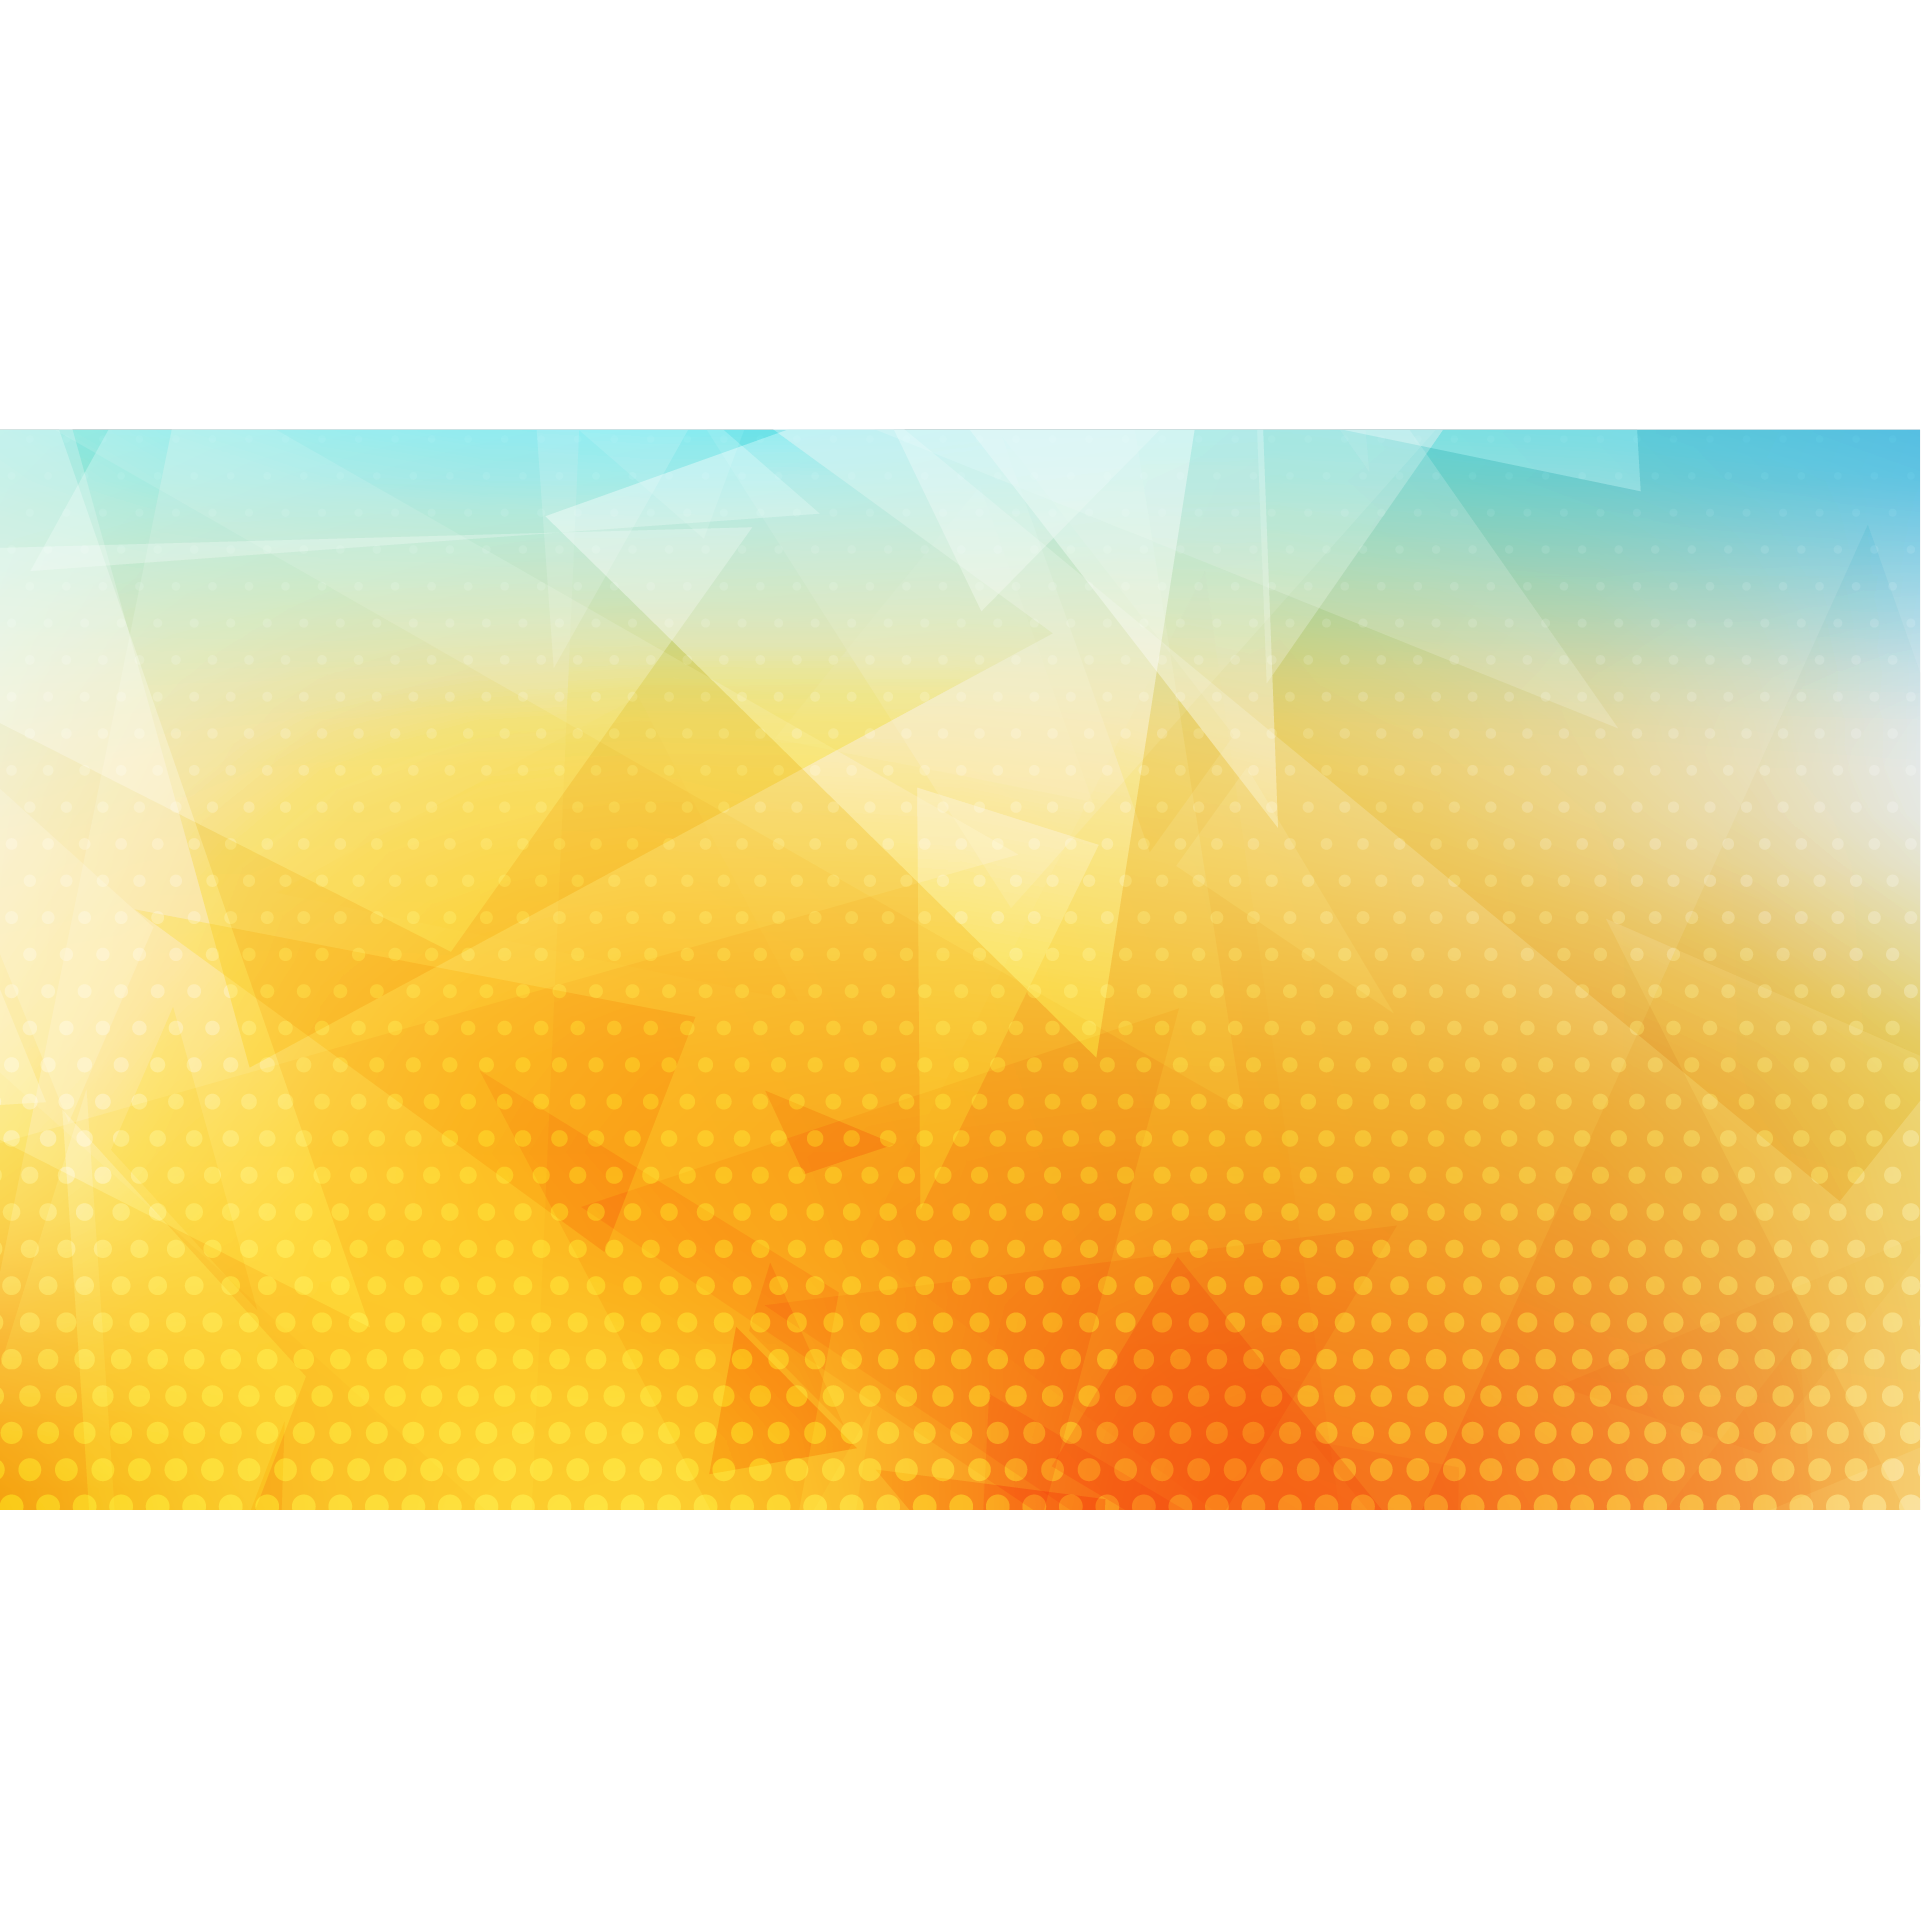 Download Orange Wallpaper Fortnite Yellow Desktop Hq Image Free Png Hq Png Image Freepngimg